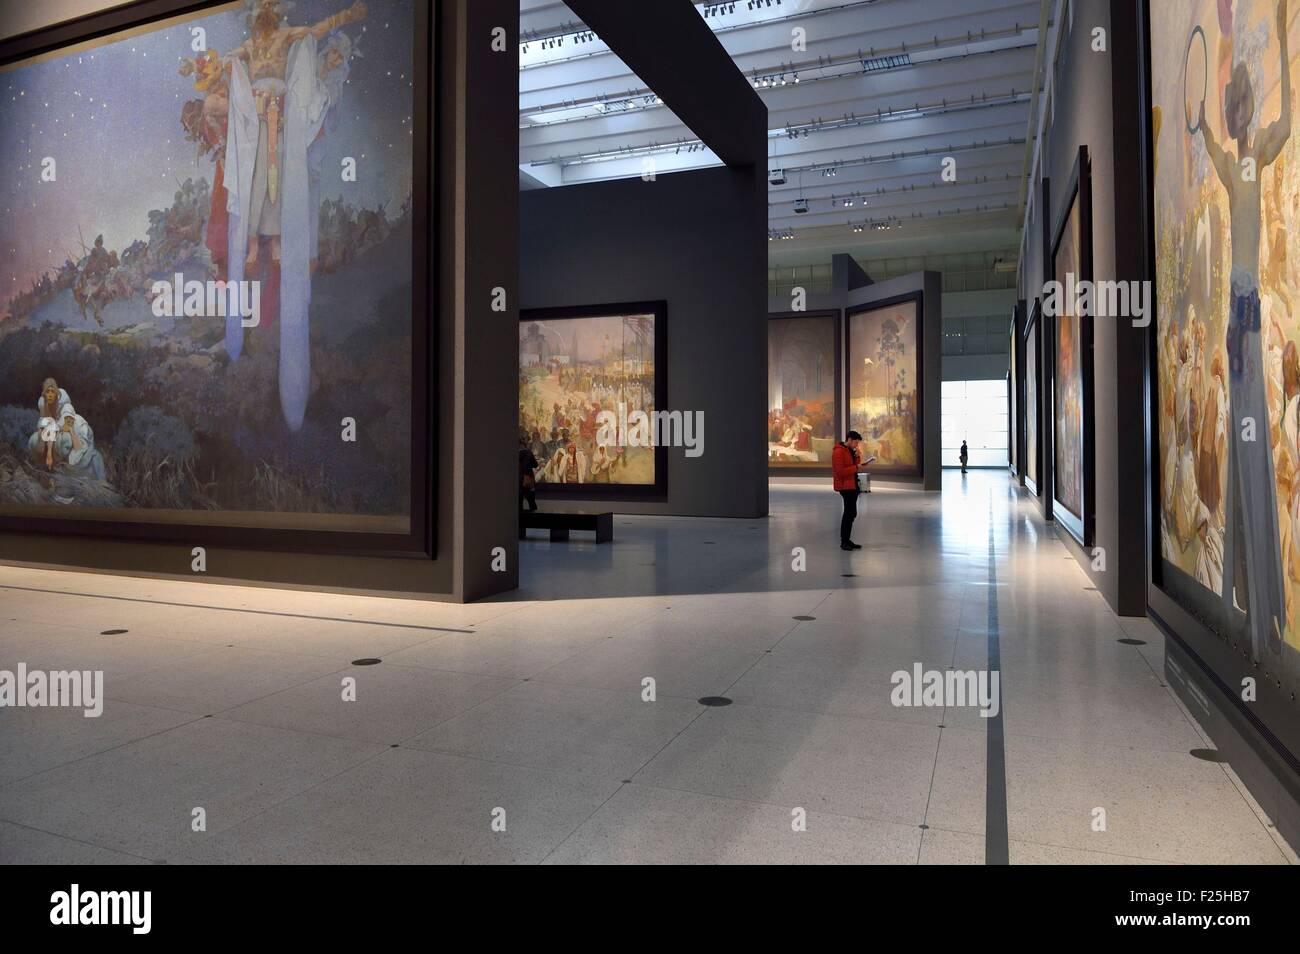 Czech Republic, Prague, Palace of Fairs and Exhibitions (Veletrznφ's Palace), permanent exhibition of twenty - Stock Image